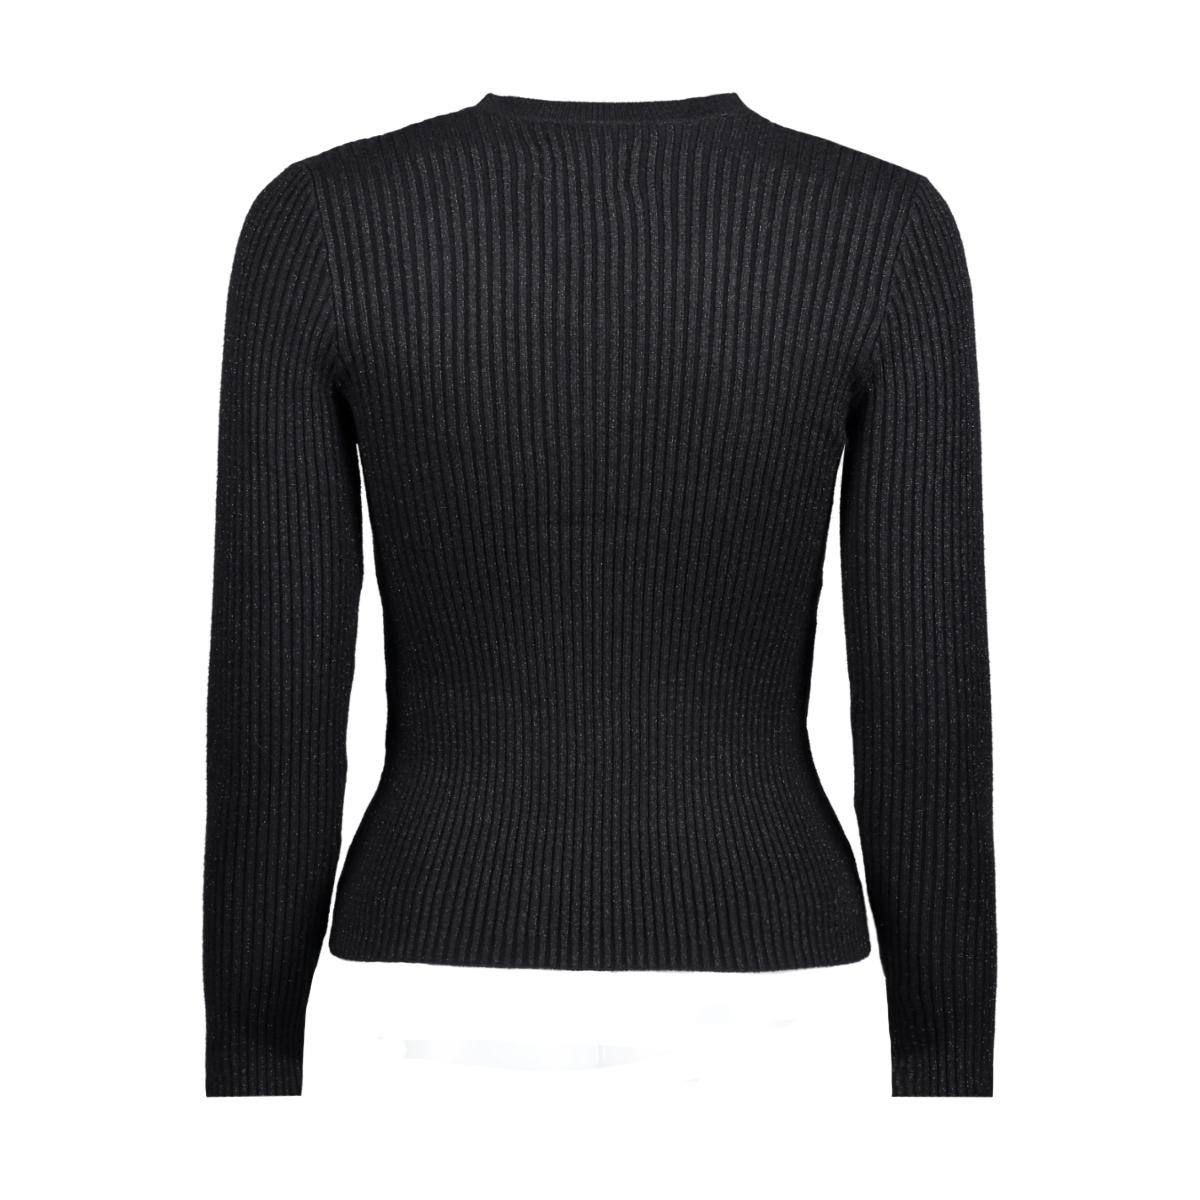 onlchoker l/s pullover knt 15144604 only trui black/w.gunmeta